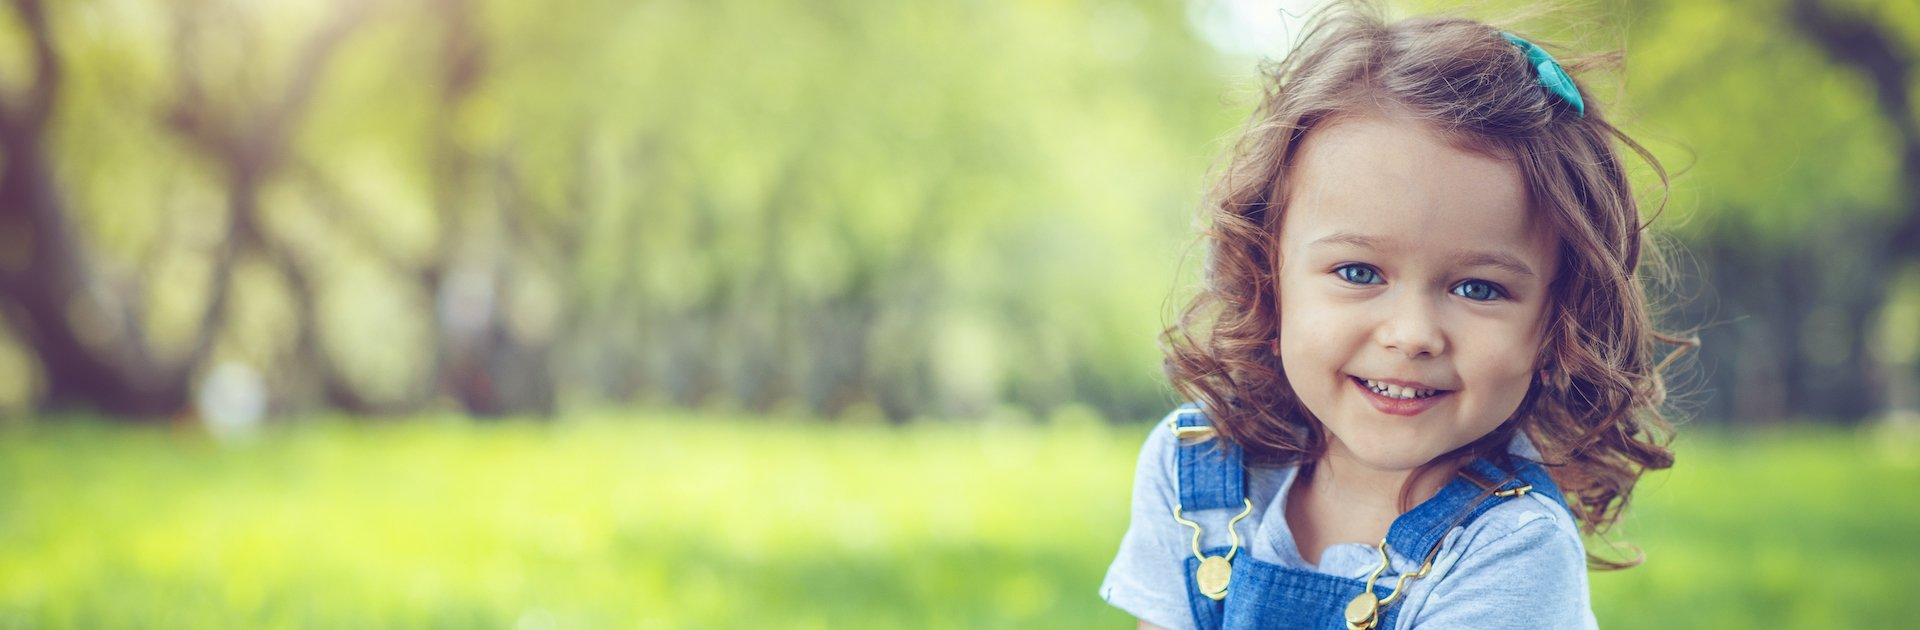 Familienurlaub | Urlaub mit Kindern